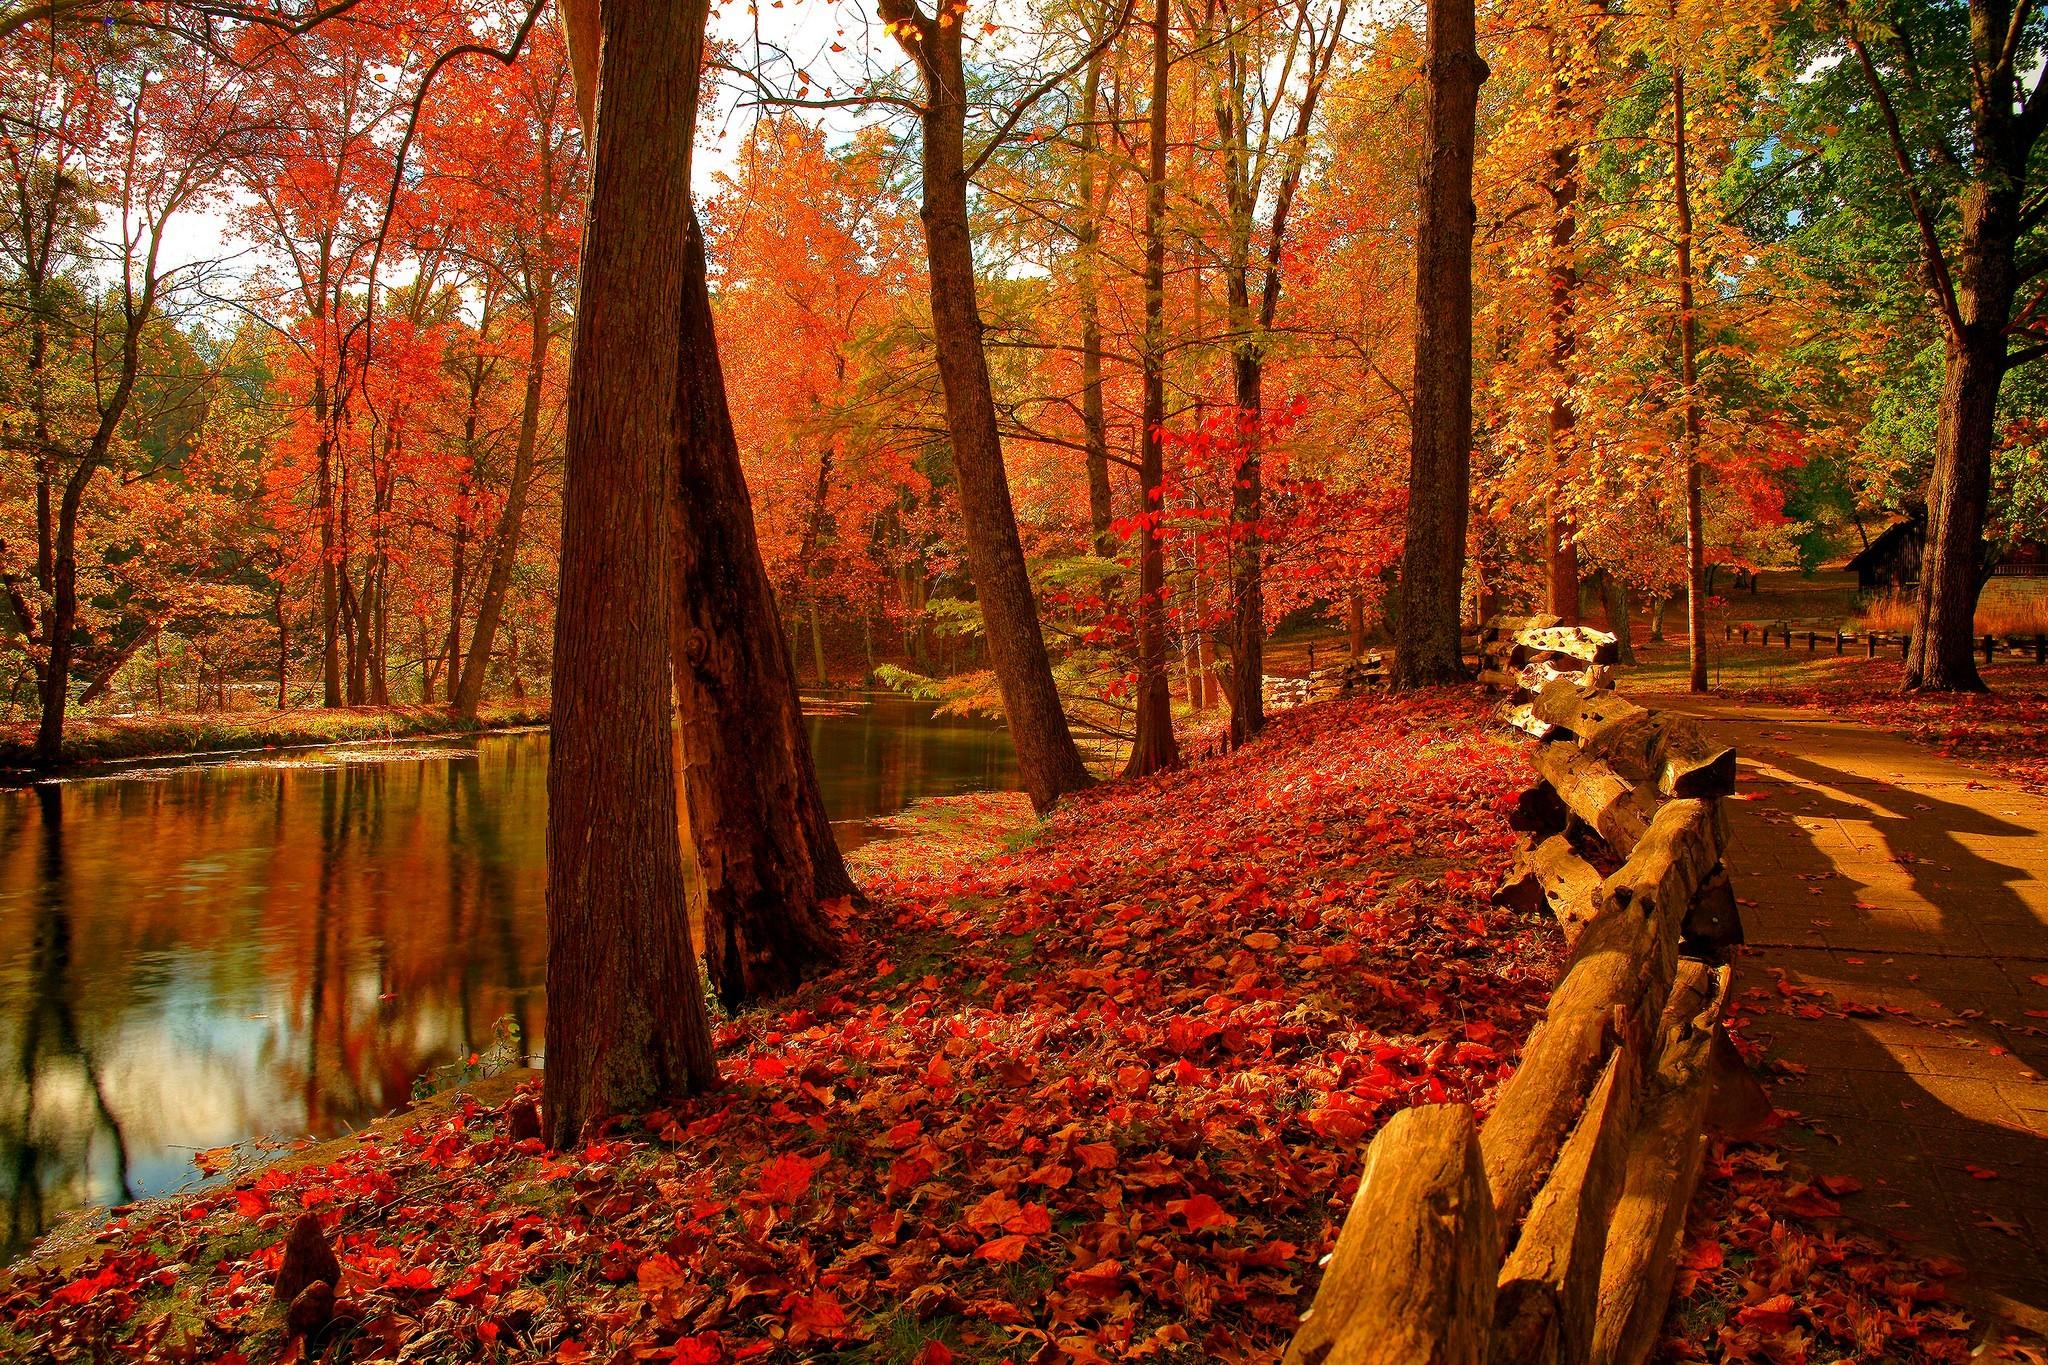 Red Fall Leaves Iphone Wallpaper Fondos Oto 241 O Wallpapers Autumn Fondos De Pantalla De Oto 241 O